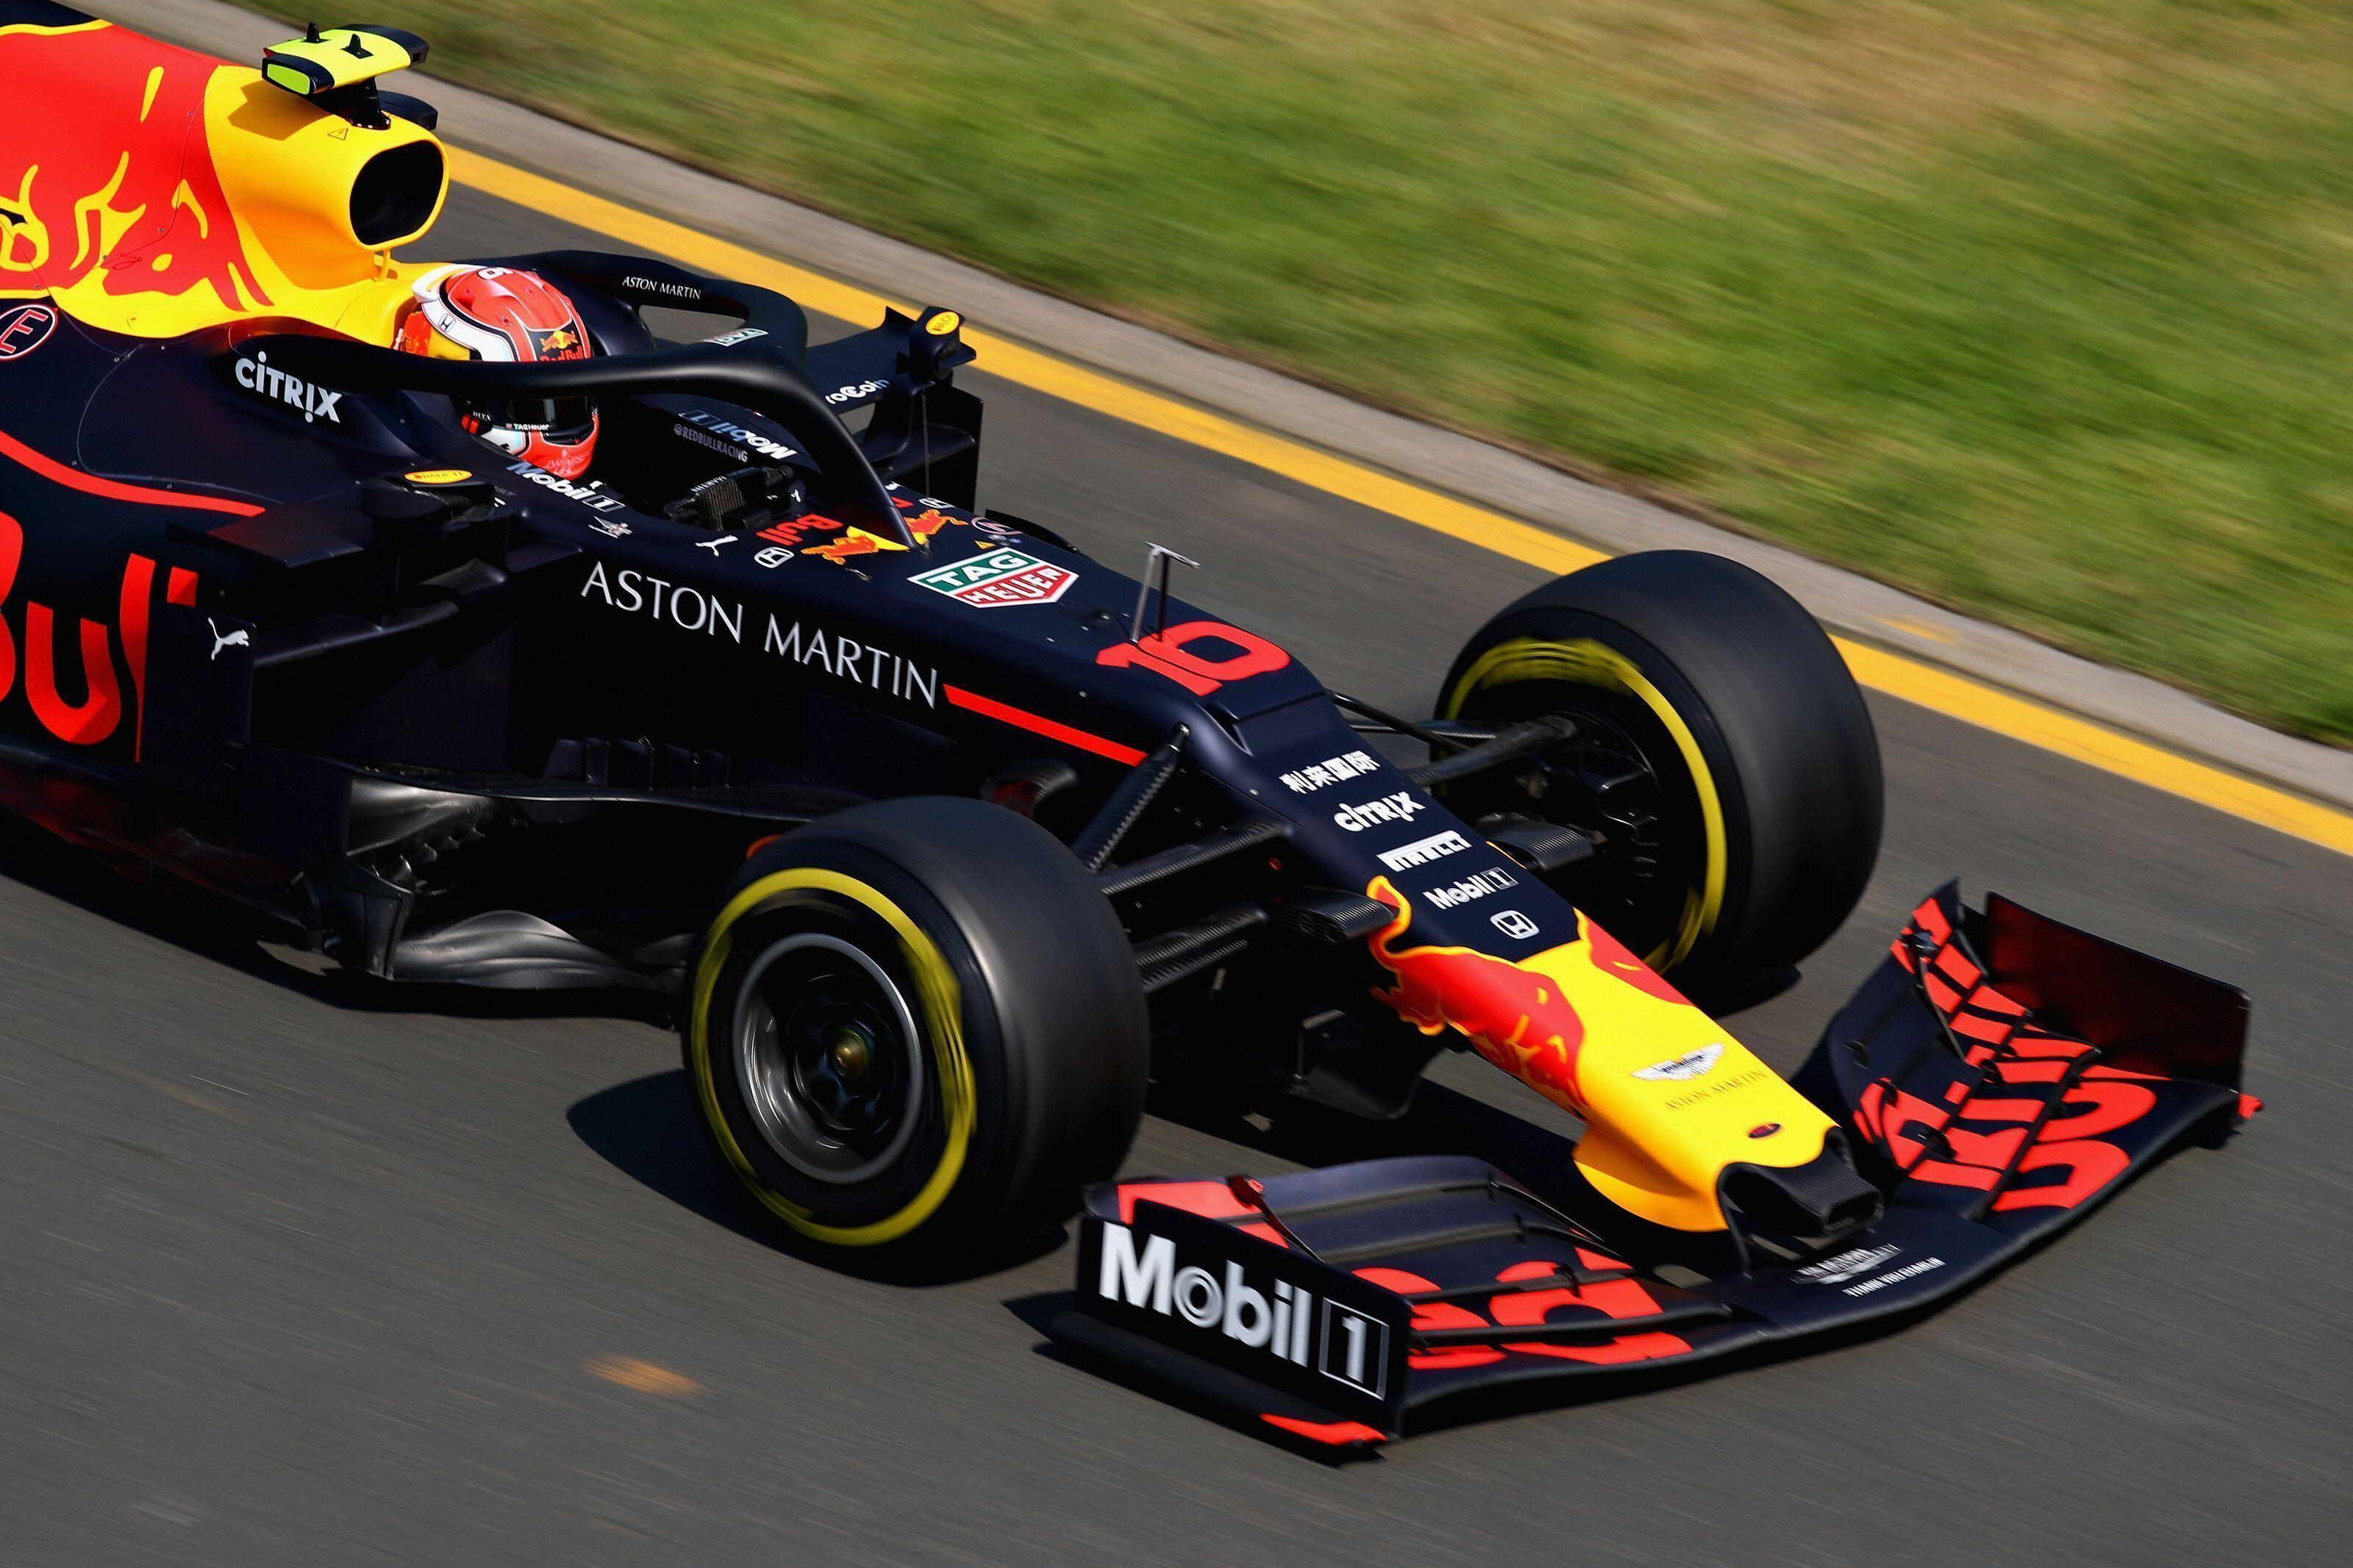 Pirelli names mandatory F1 Monaco GP compounds